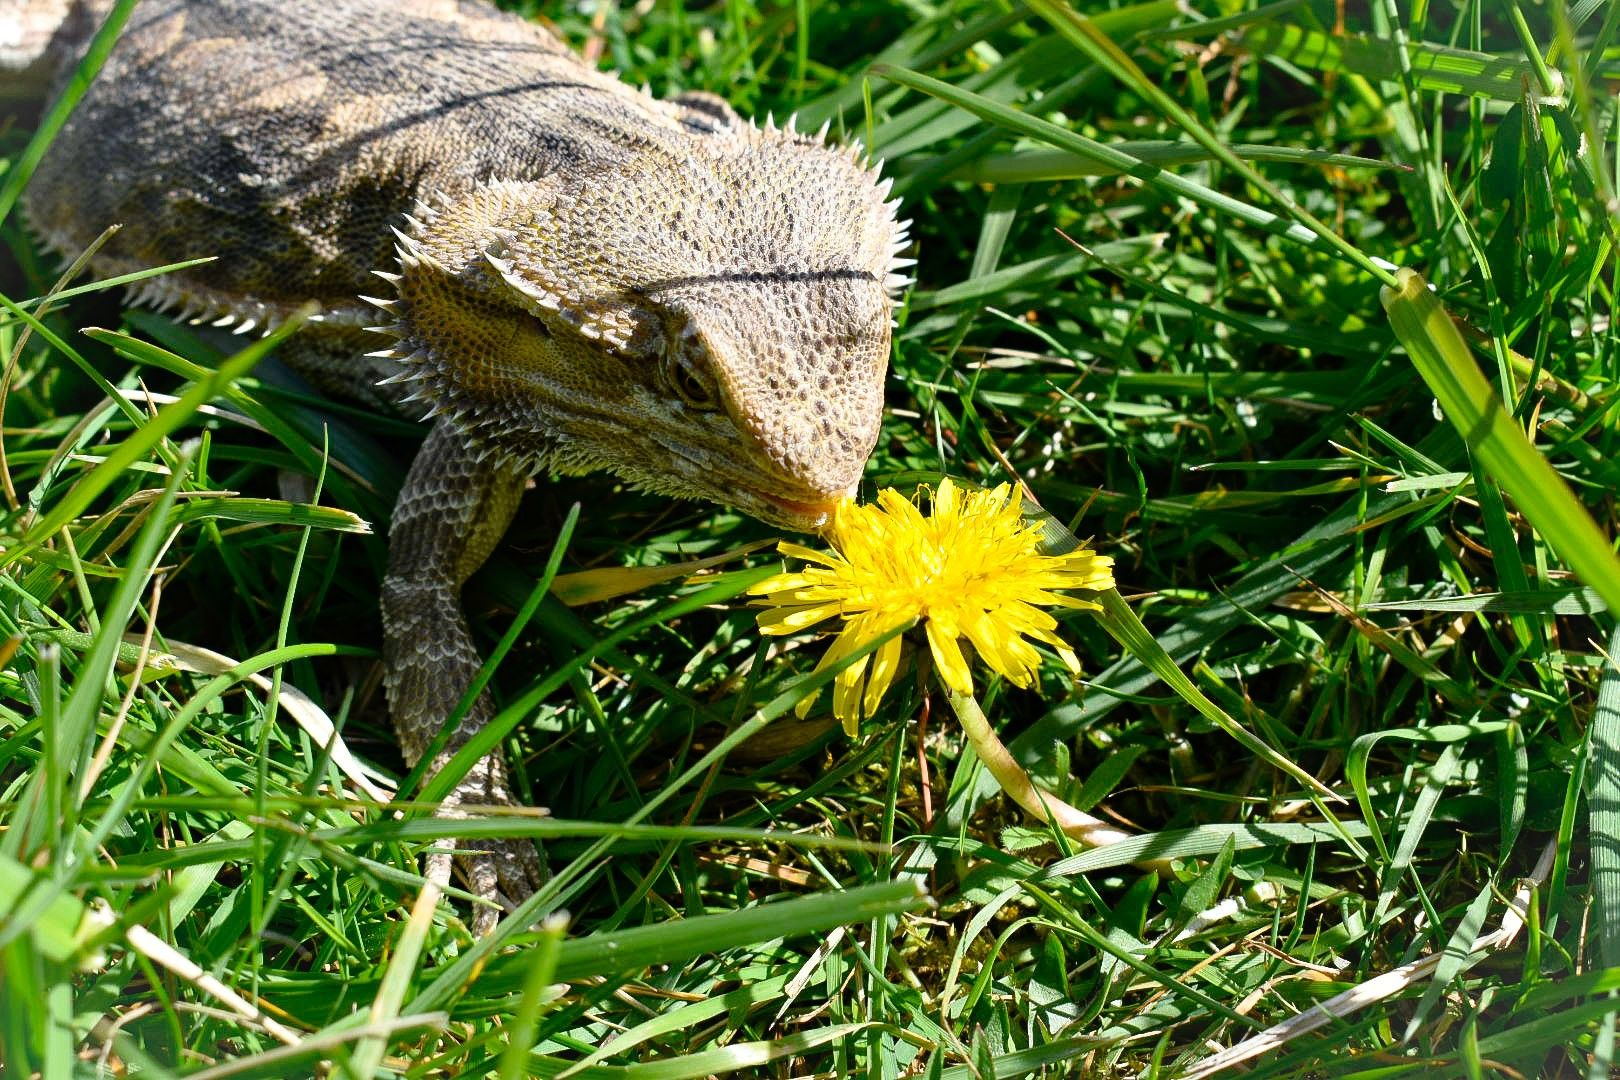 Bearded Dragon And Dandelion In 2020 Bearded Dragon Animals Lizard